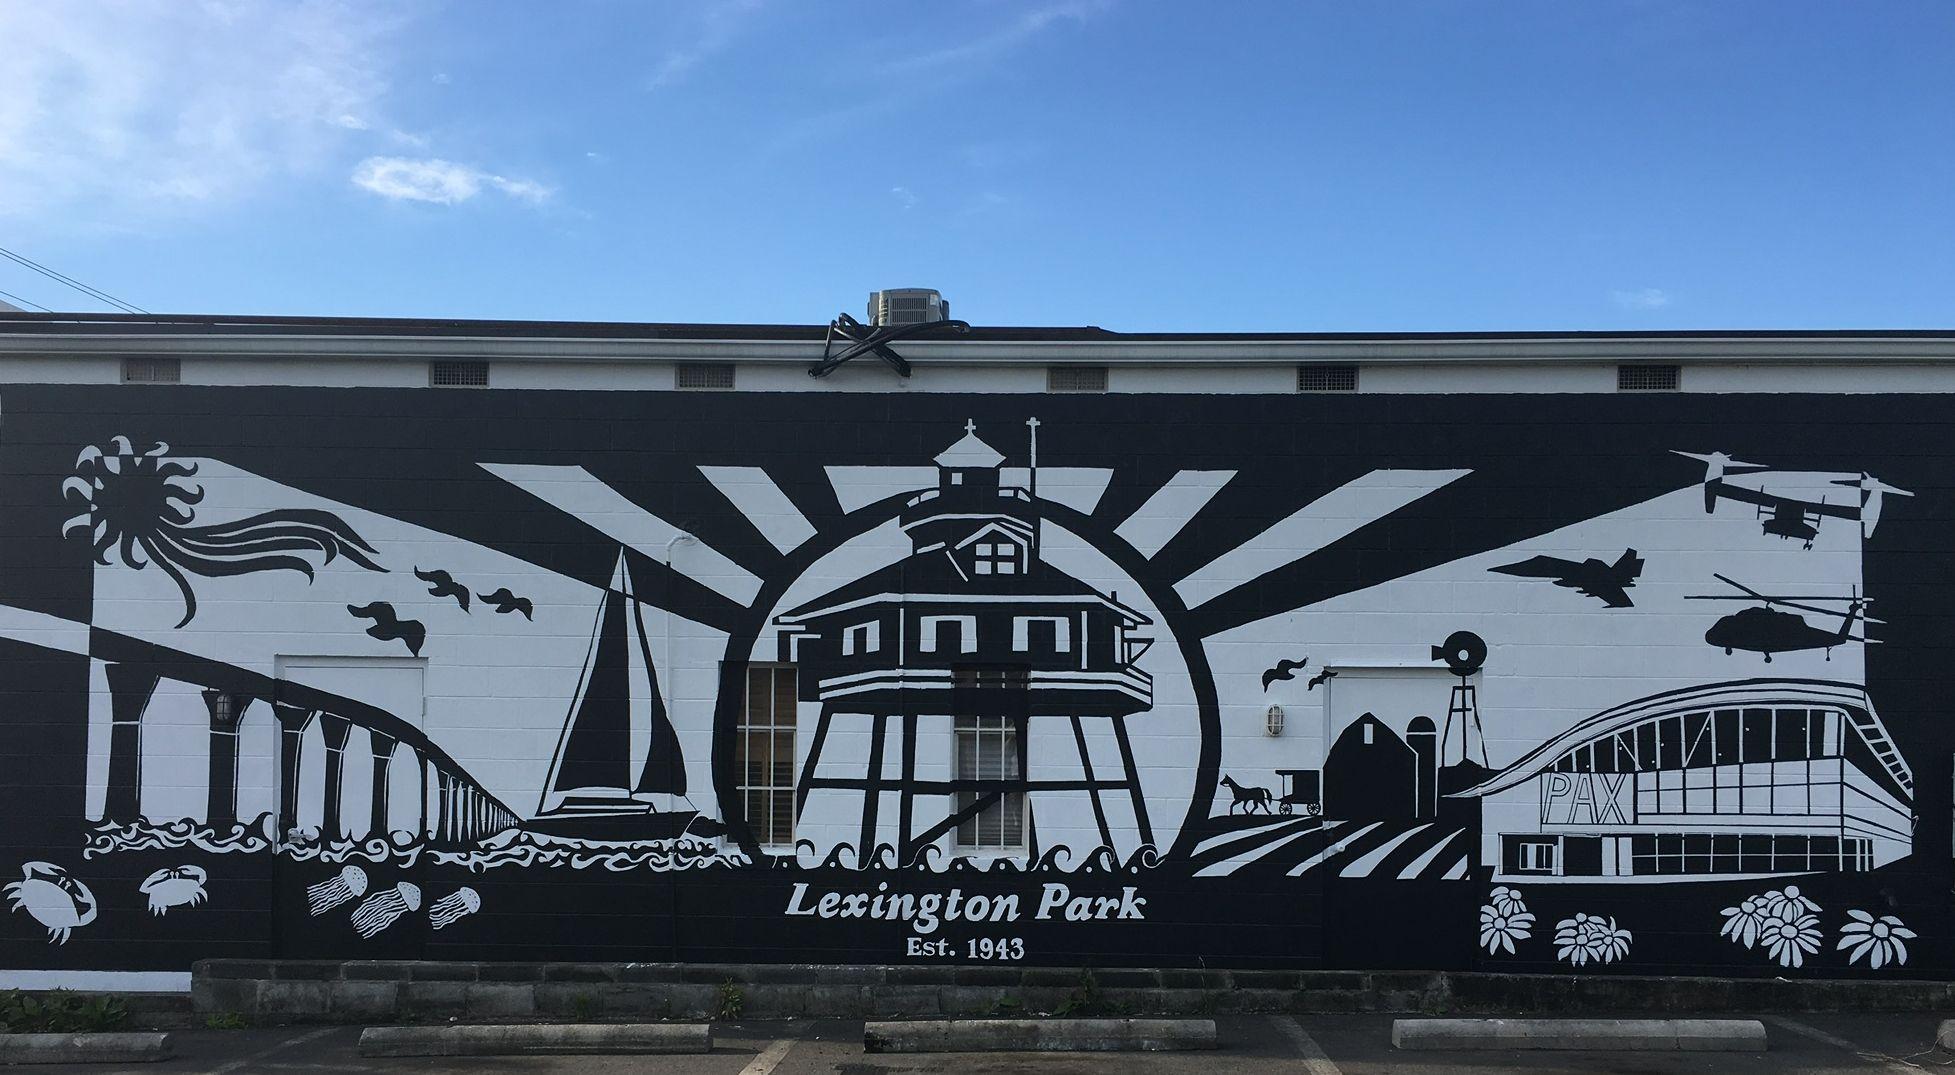 Tag Dyson Building Supply Lexington Park Mural